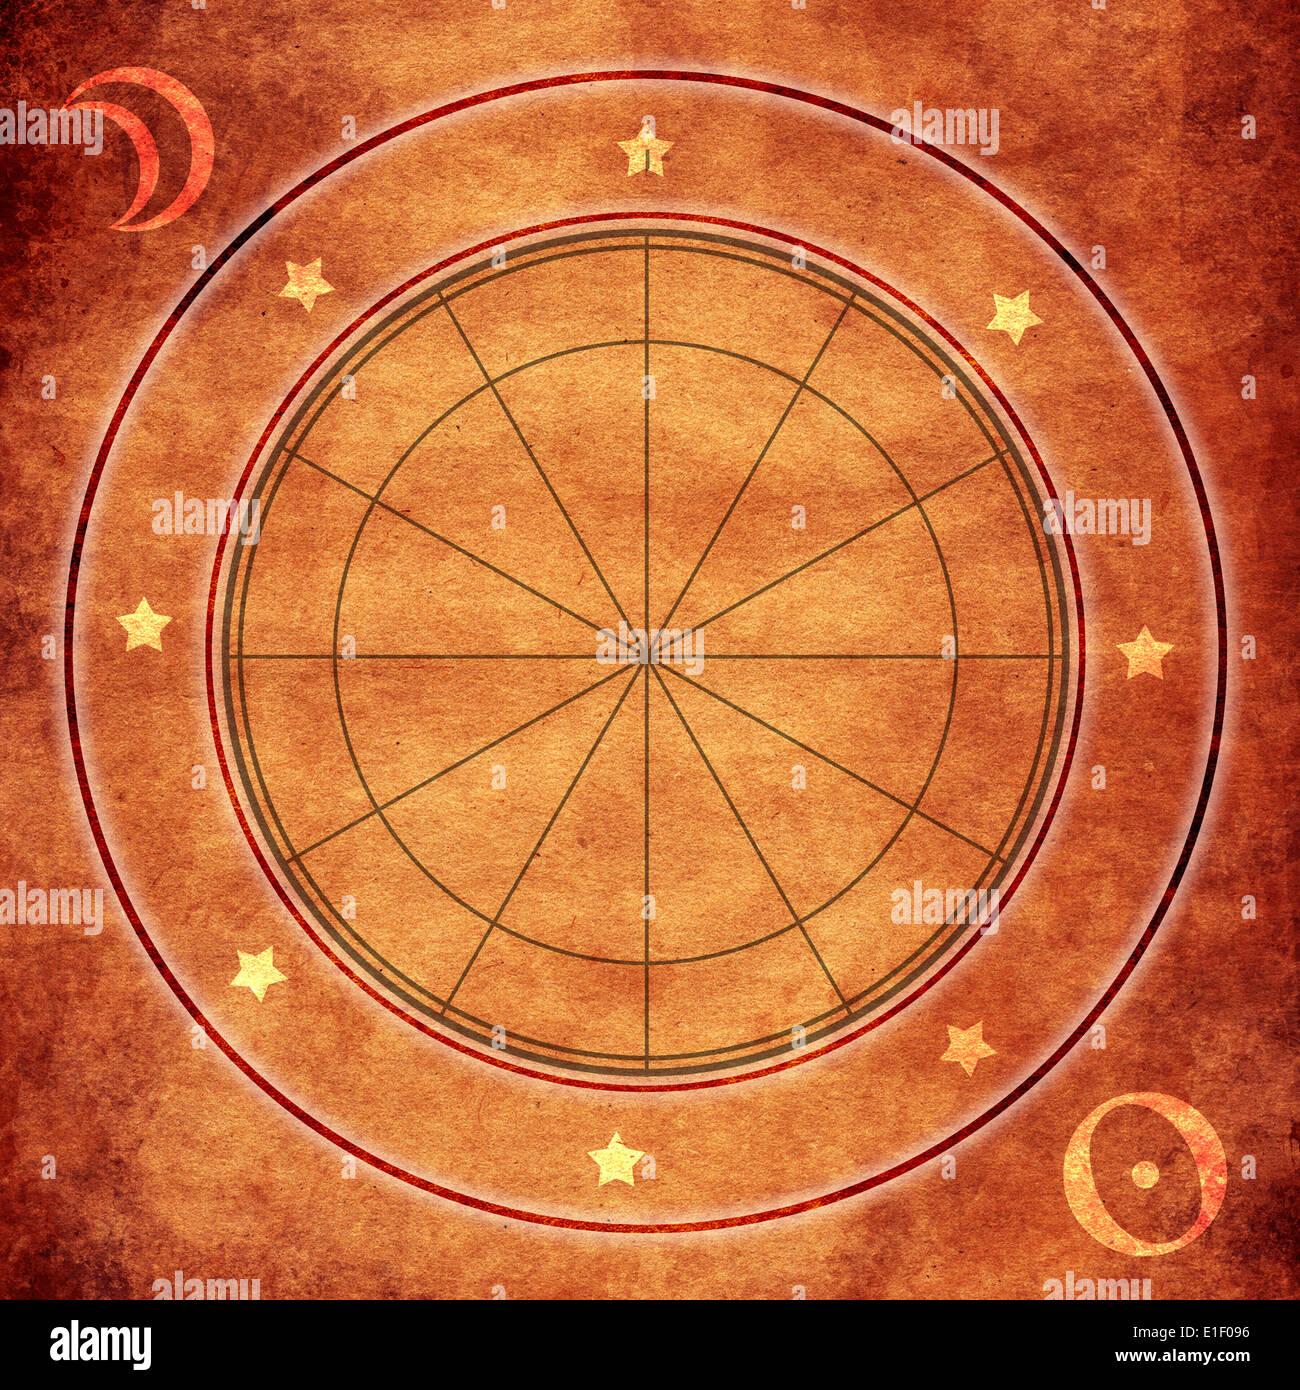 Blank Astrological Wheel Stock Photo Alamy